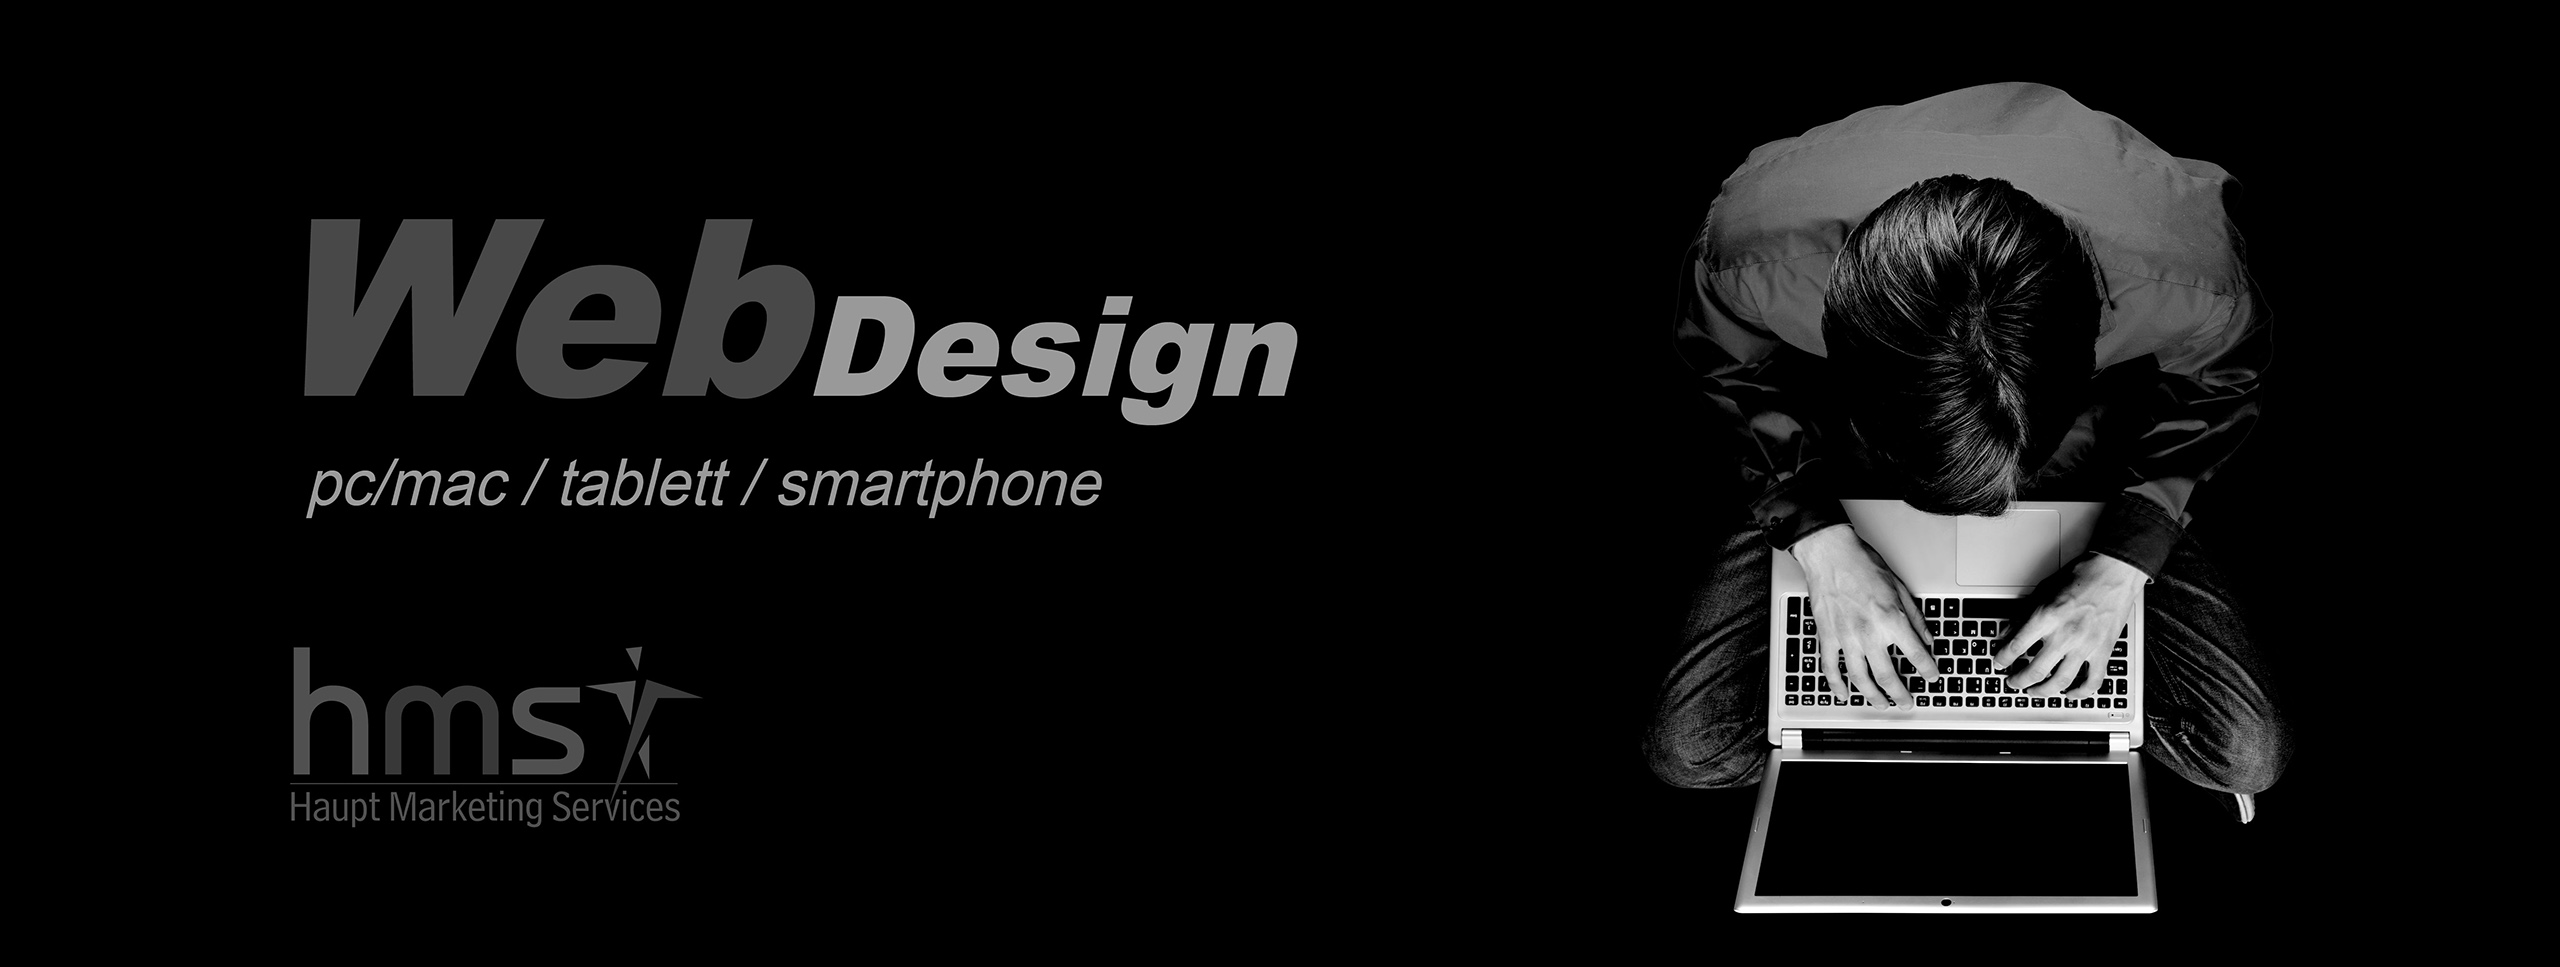 005_Web01_2017_Webdesign_sw